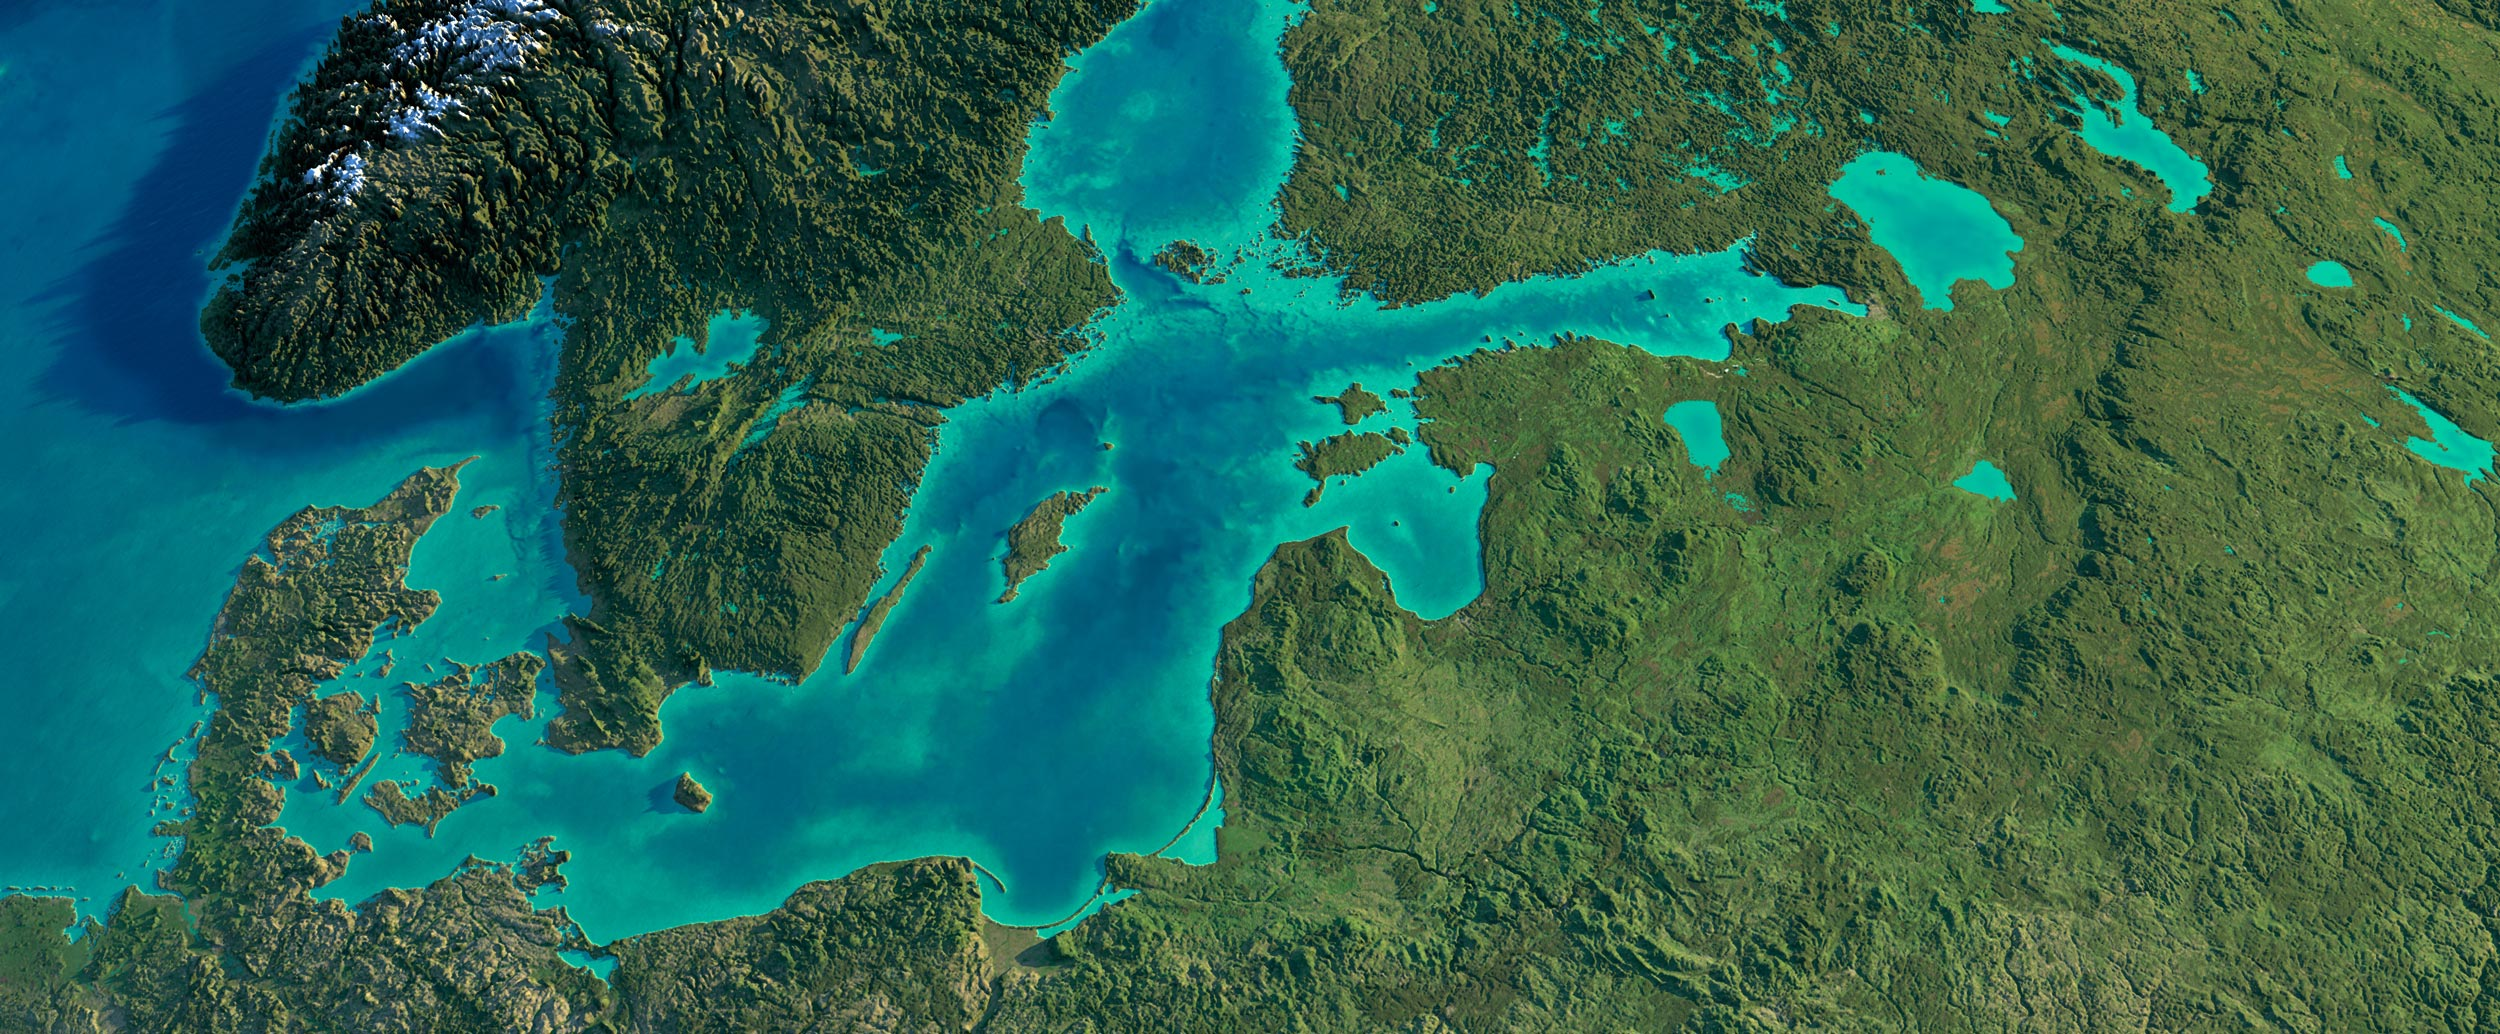 ECOPRODIGI project increasing maritime industry digitalization in the Baltic Sea Region has started